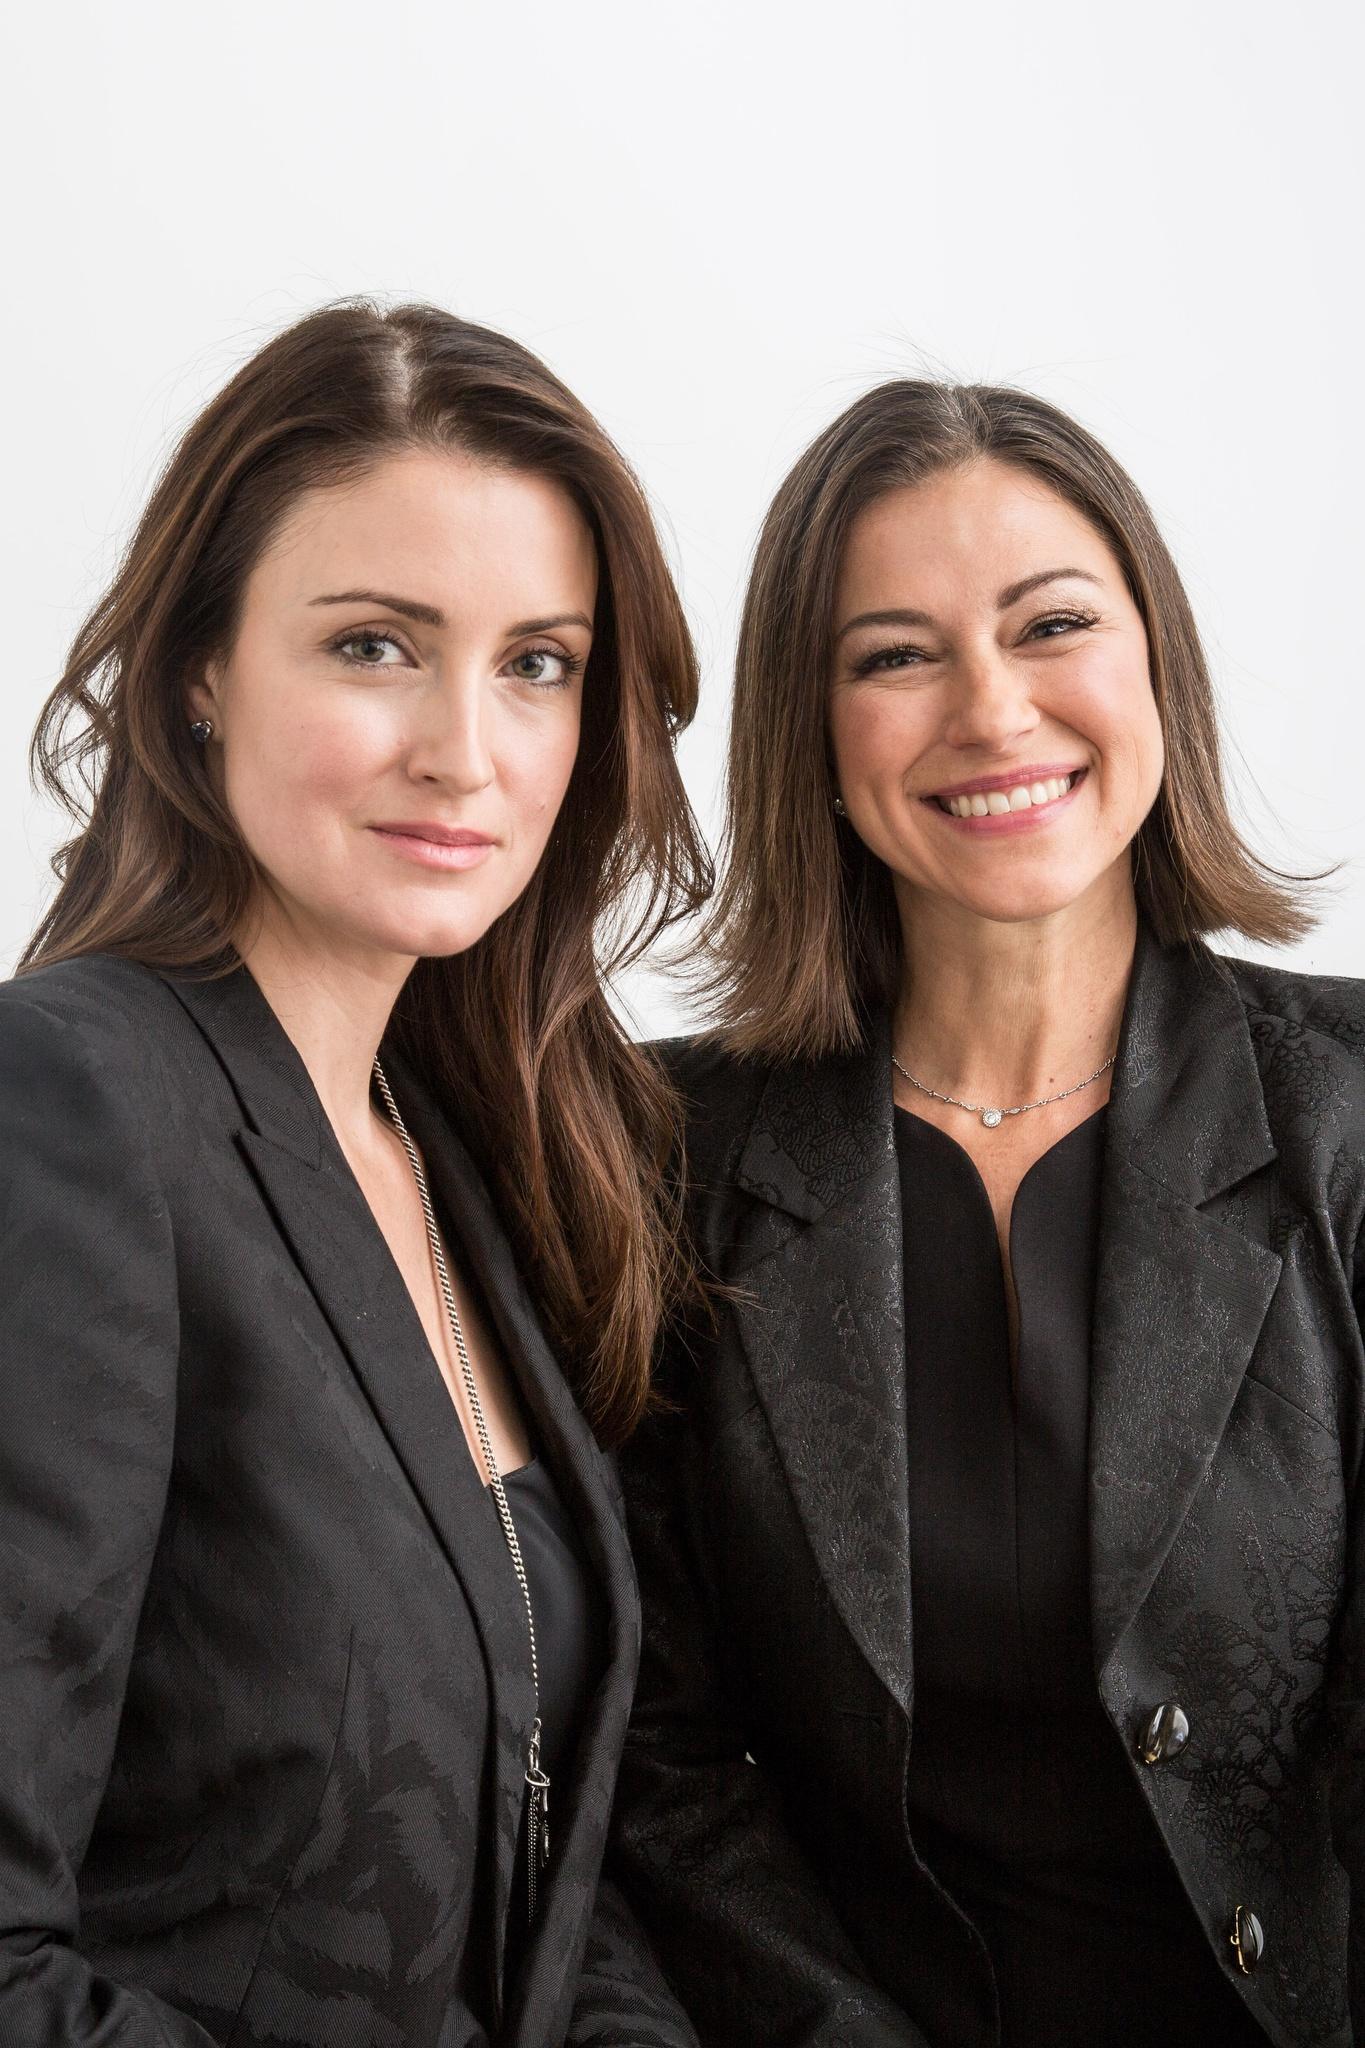 Furtuna Skin cofounders Agatha Relota Luczo and Kim Walls.